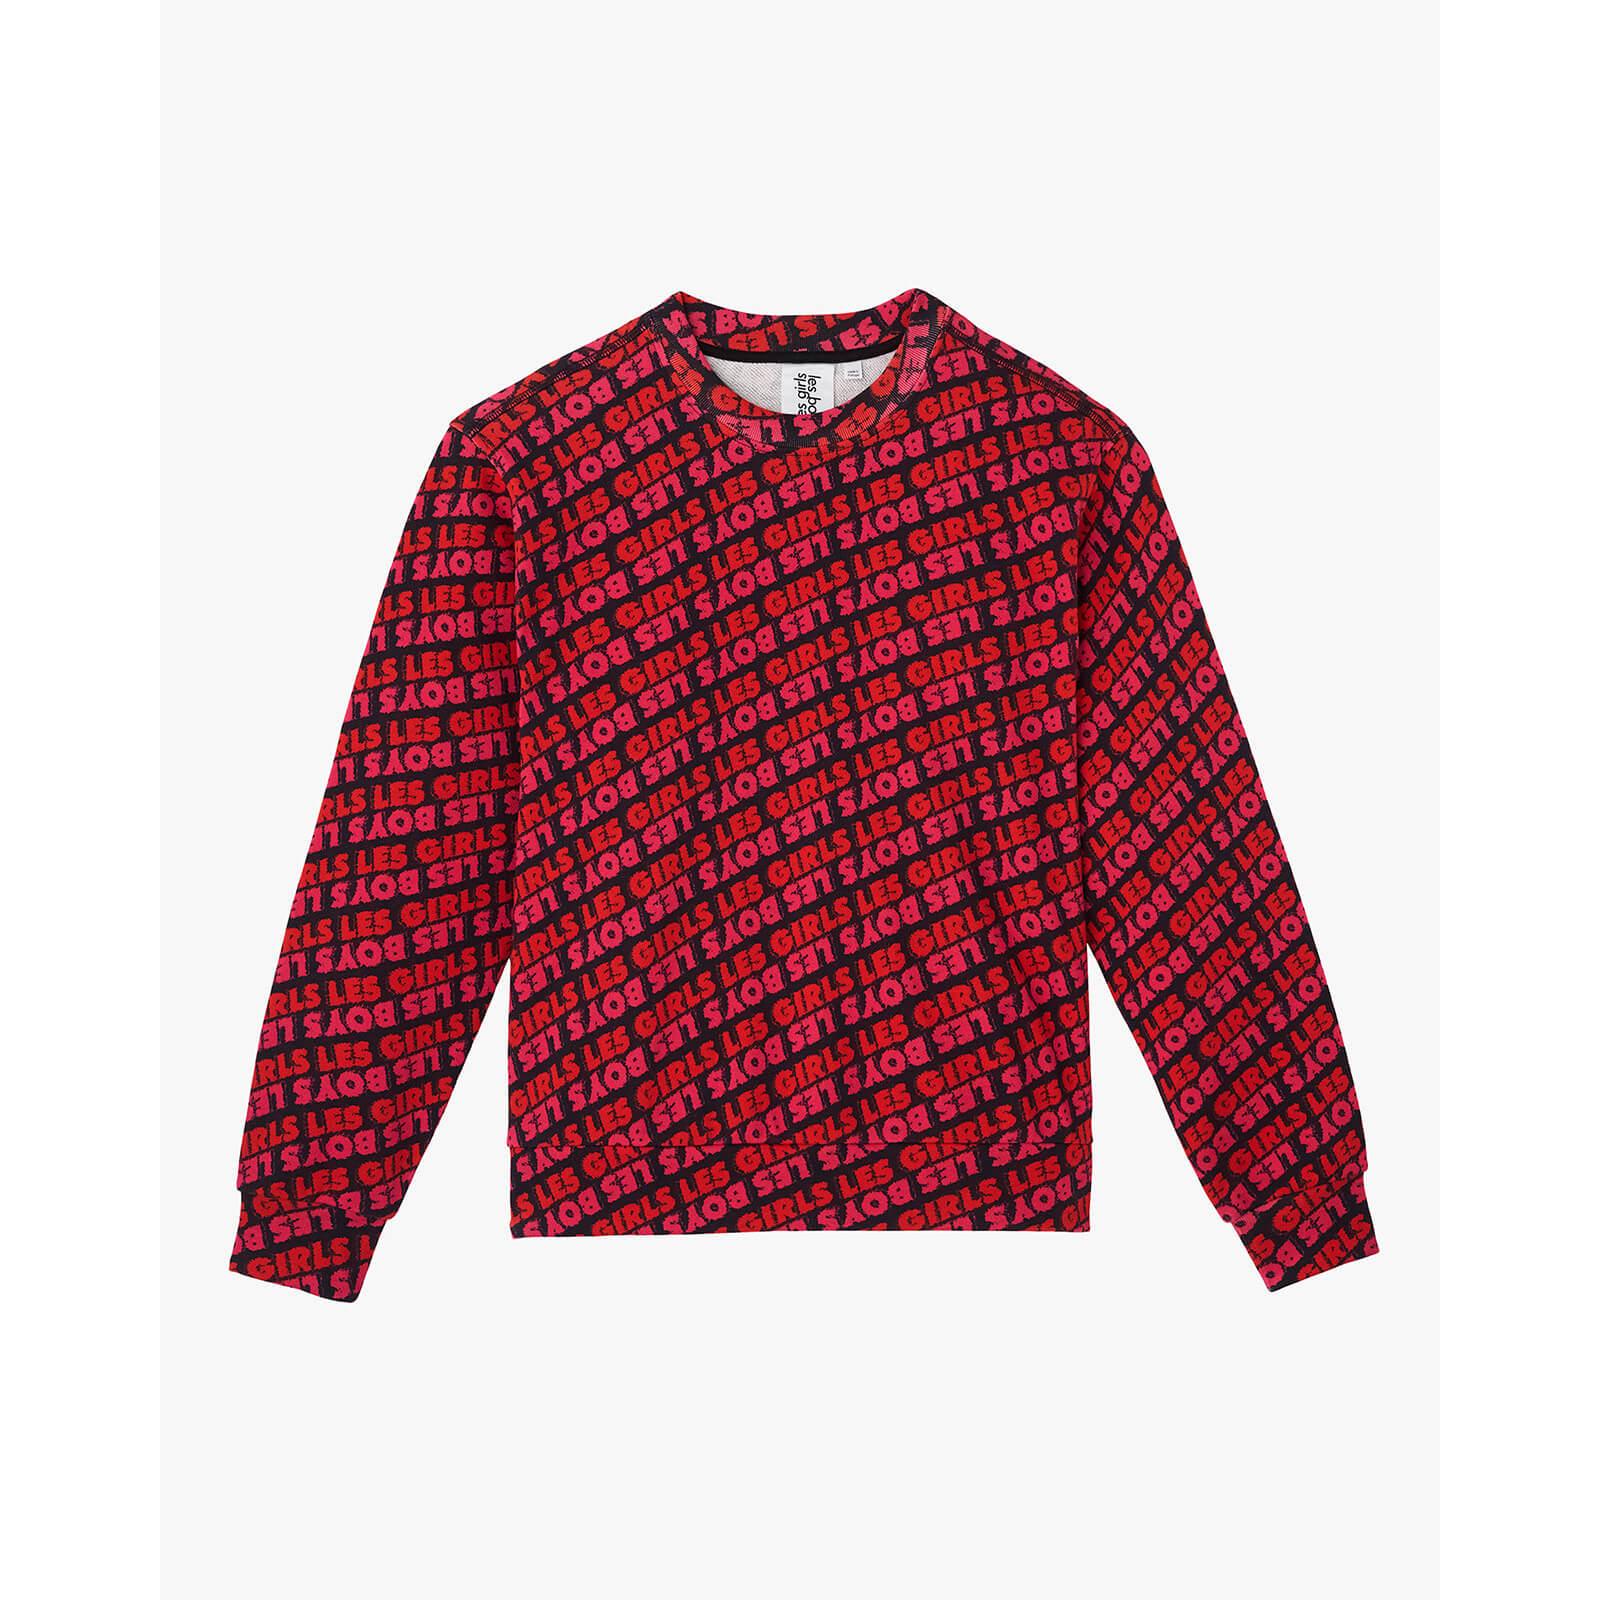 Les Girls Les Boys Women's Fuzzy Print Crew Neck Sweatshirt - Red - XS